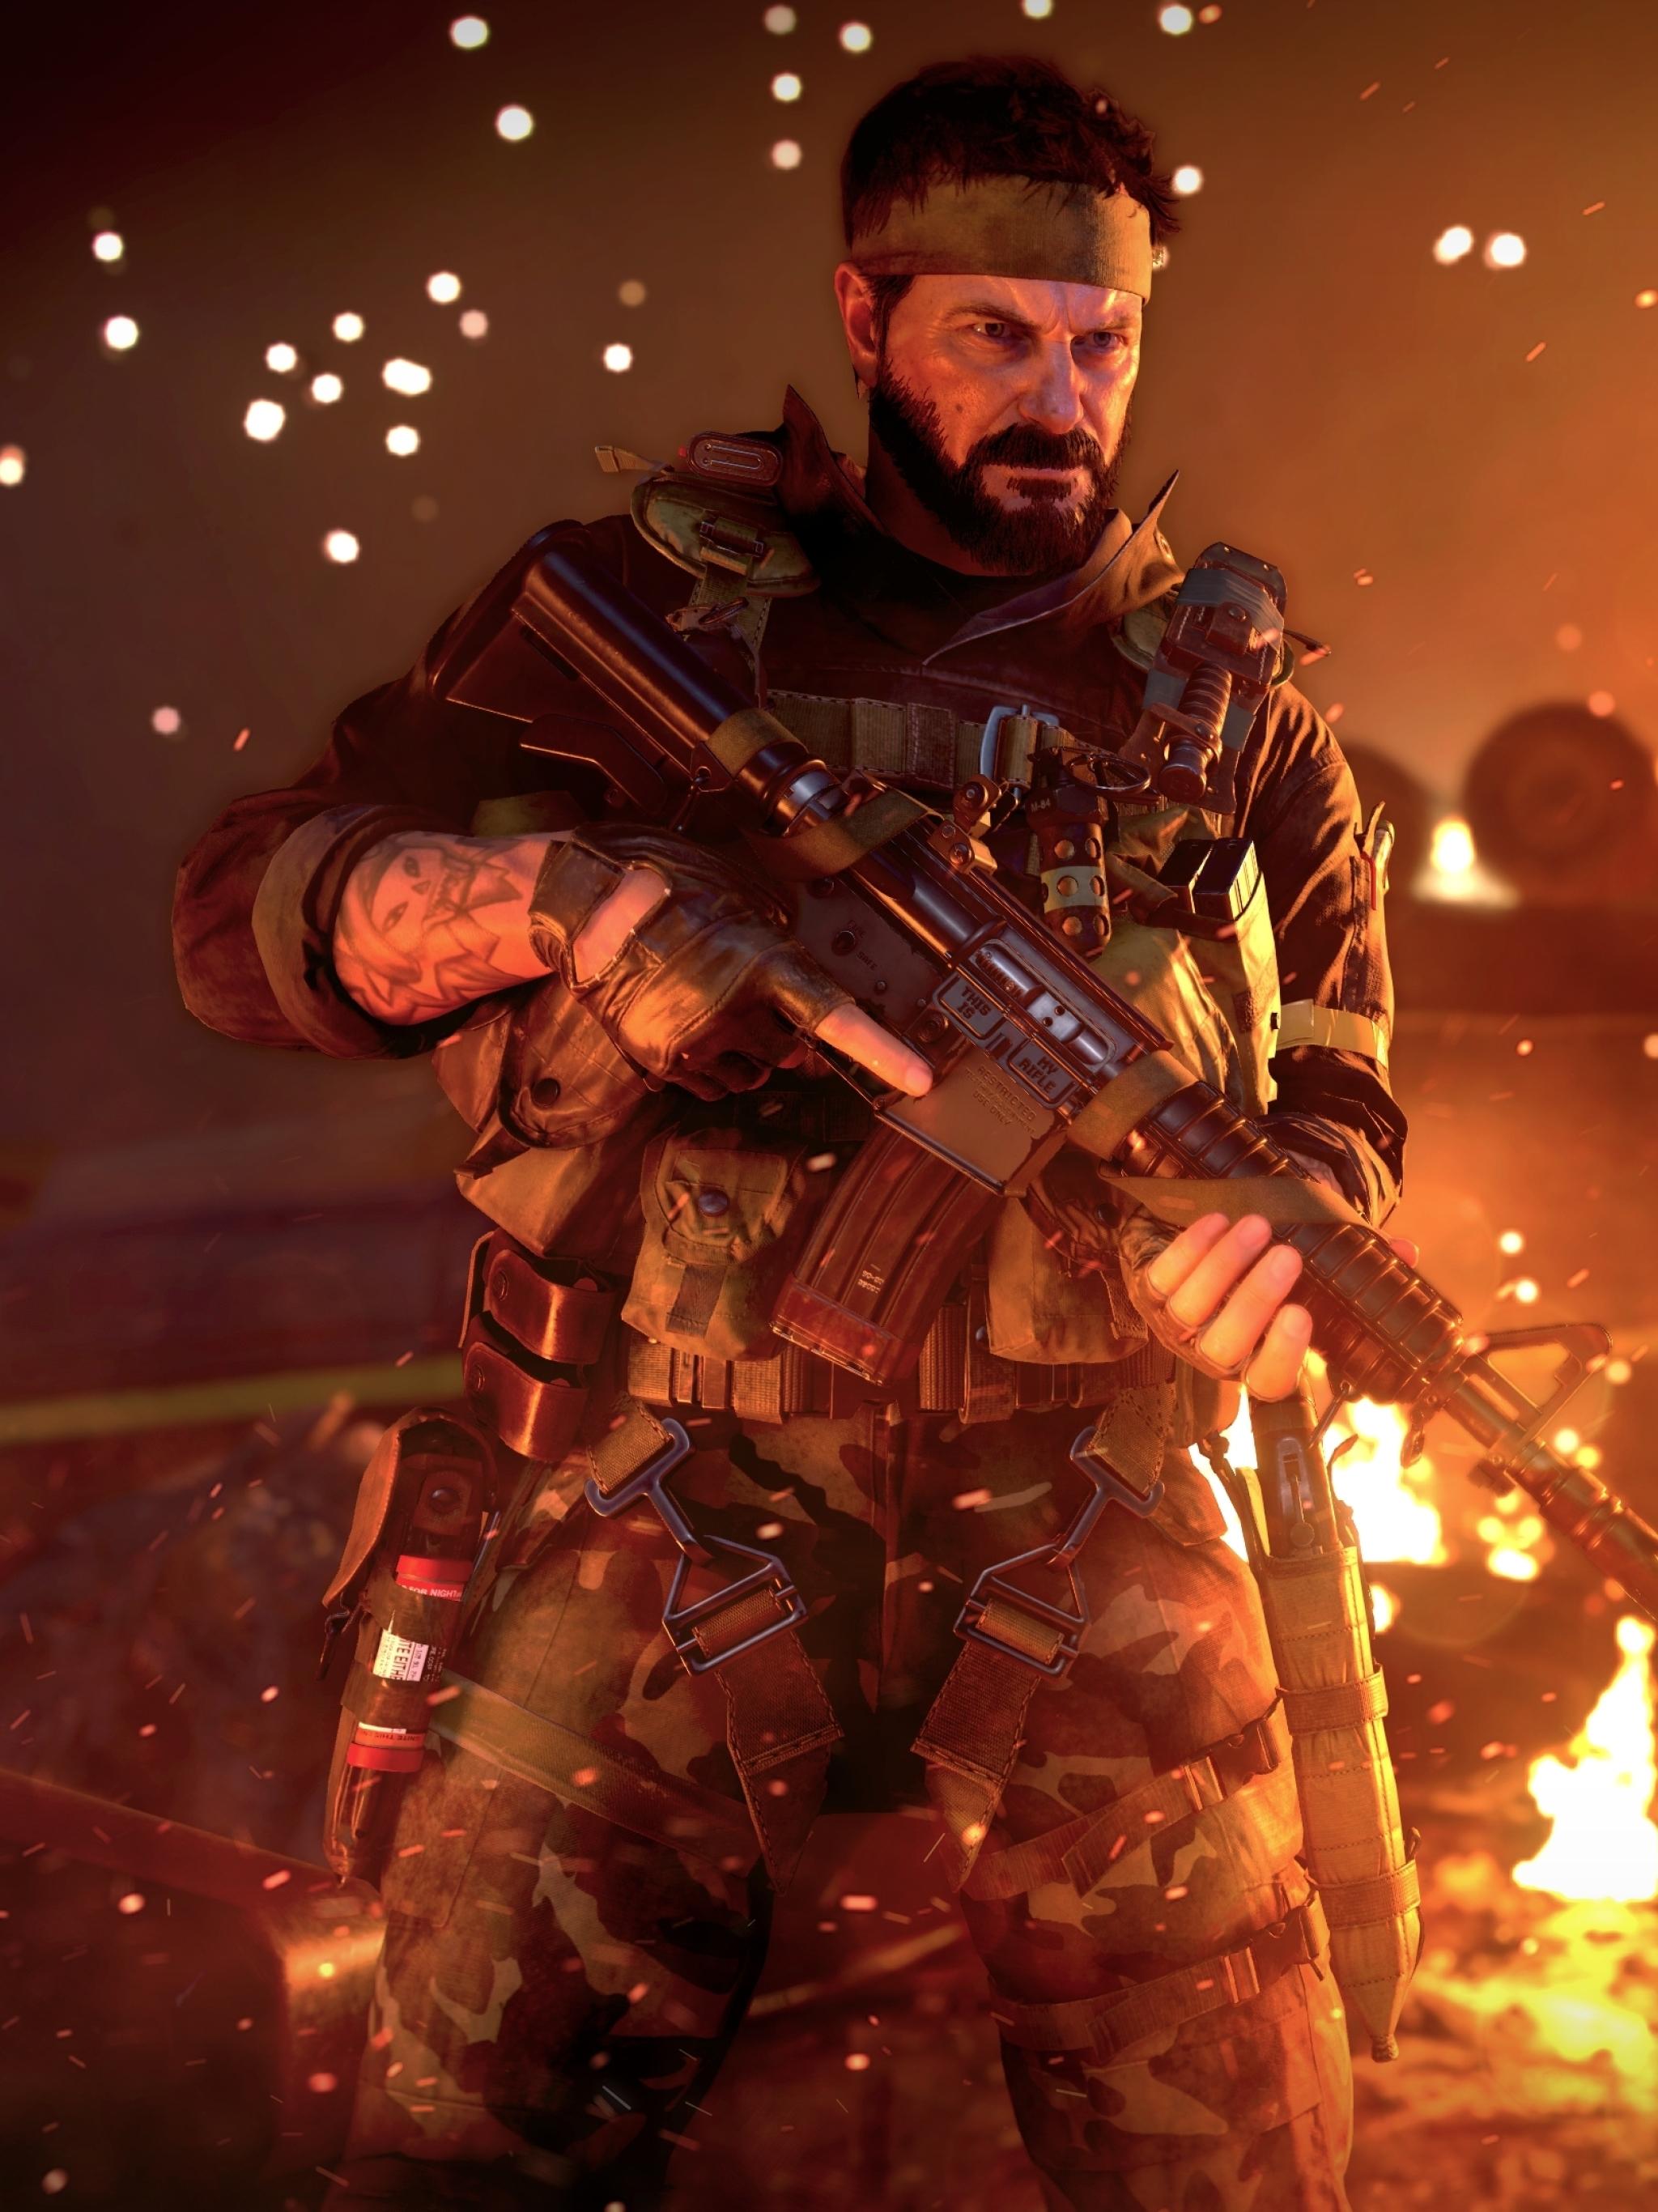 2048x2732 Call Of Duty Cold War 4K 2048x2732 Resolution ...